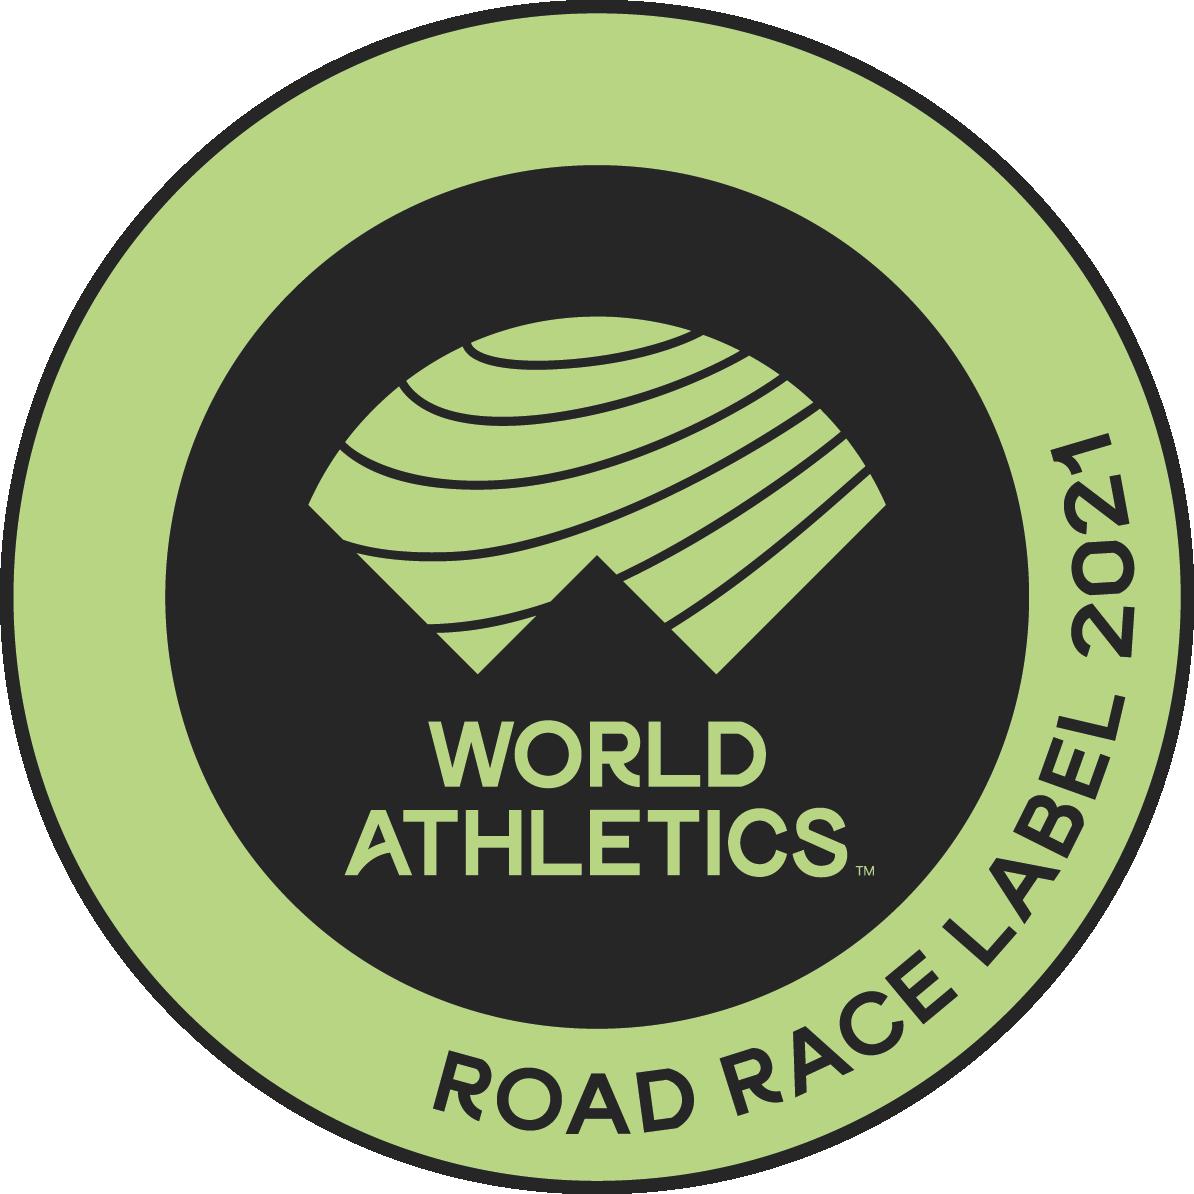 WA logosu